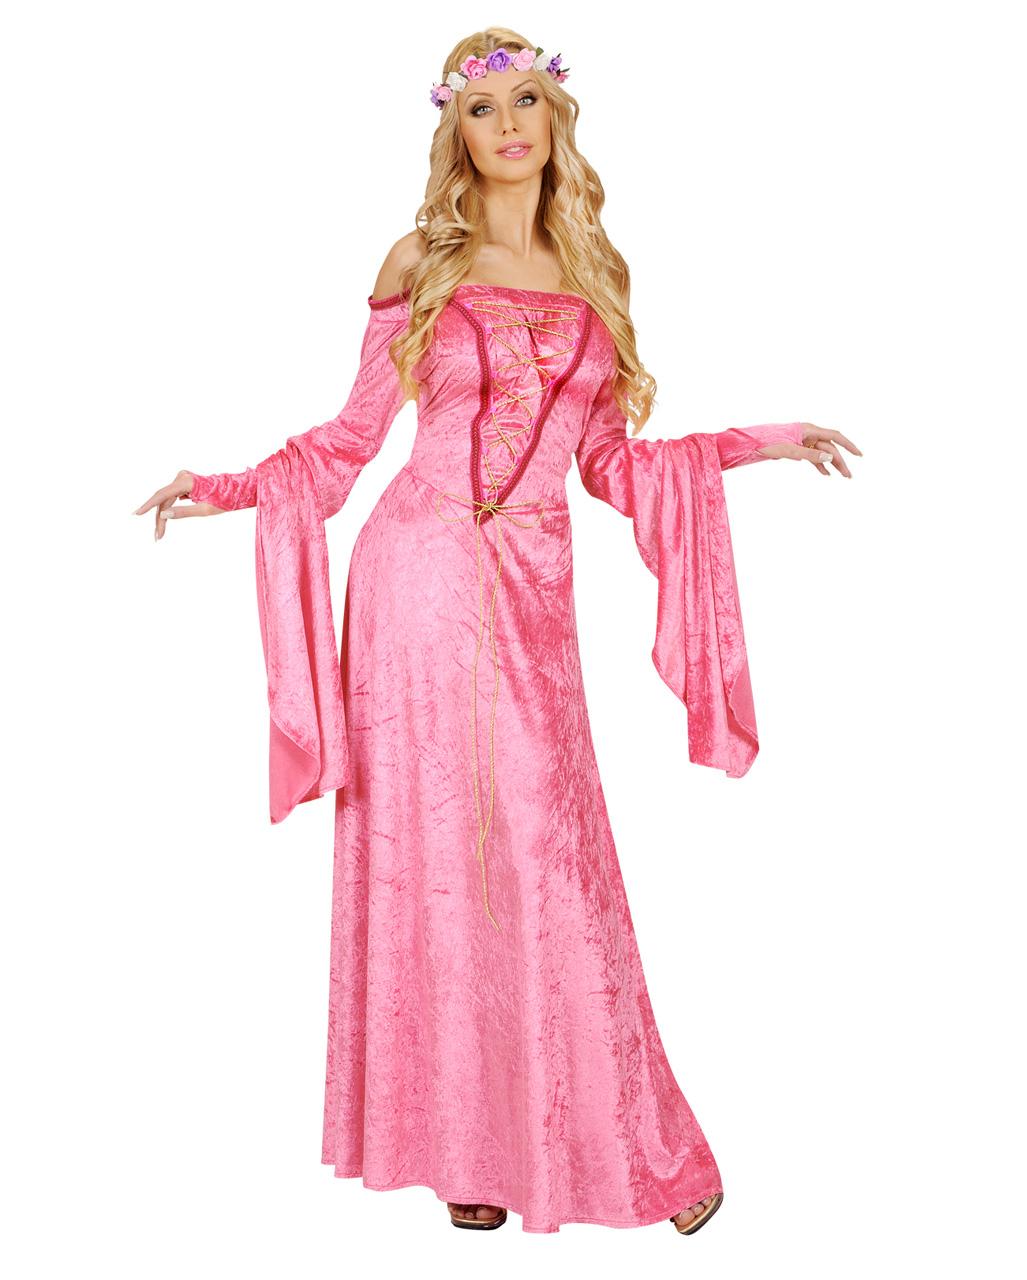 rosa aschenputtel kost m m rchenprinzessin outfit f r. Black Bedroom Furniture Sets. Home Design Ideas